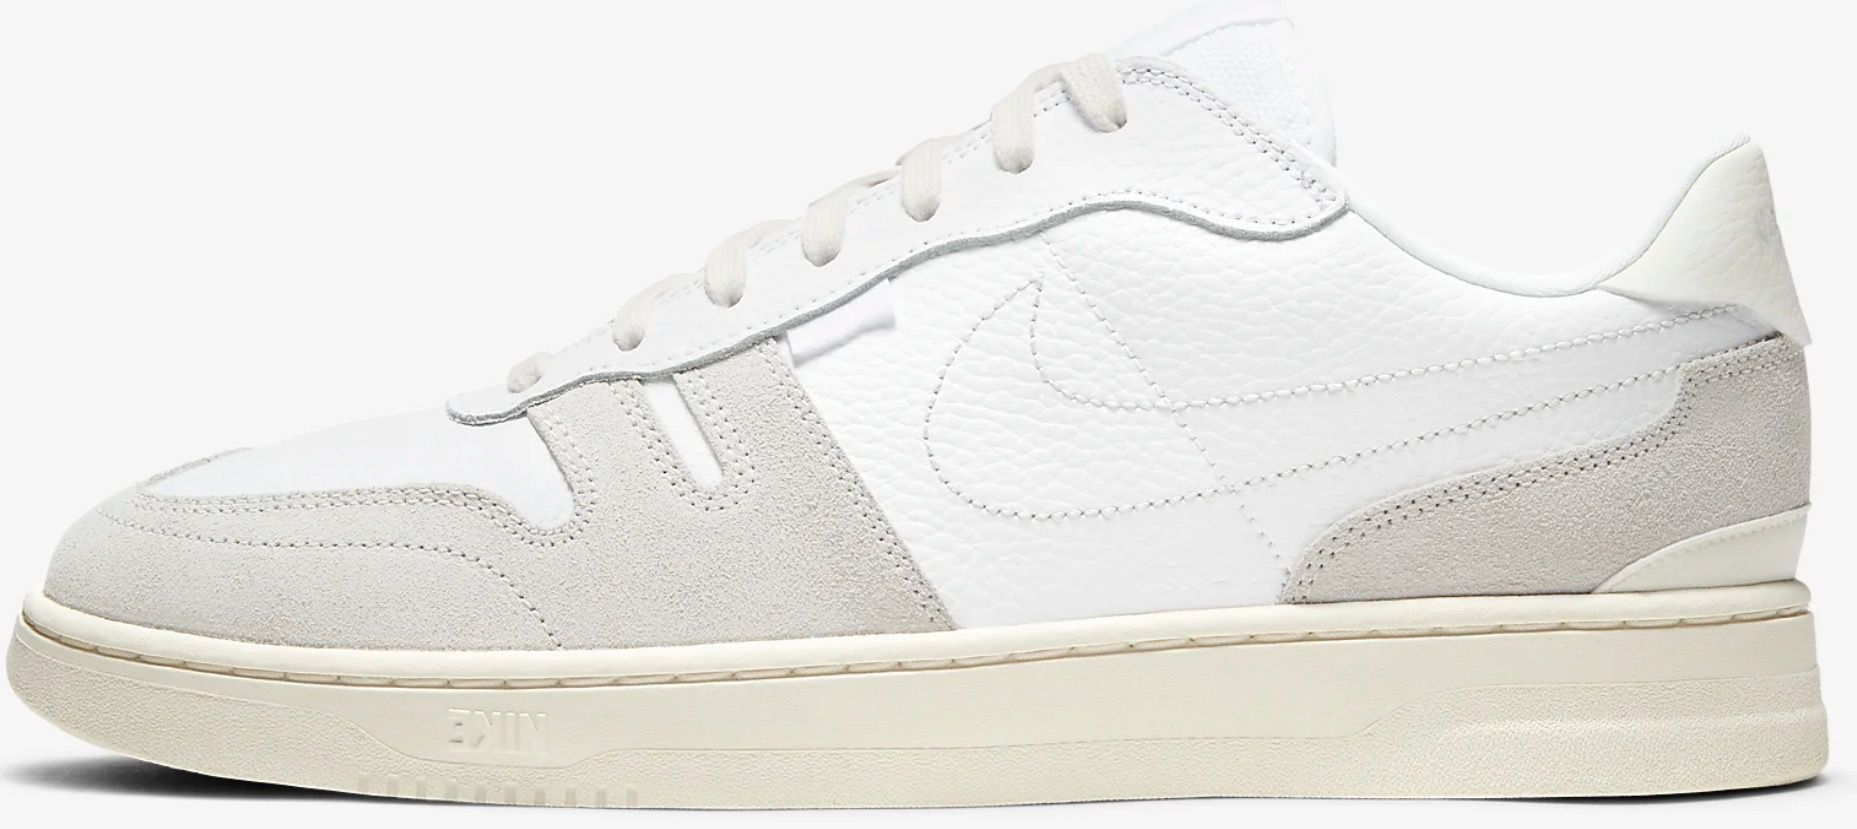 Nike Squash Type Herren Sneaker im Retro Design für 44,78€ (statt 72€)